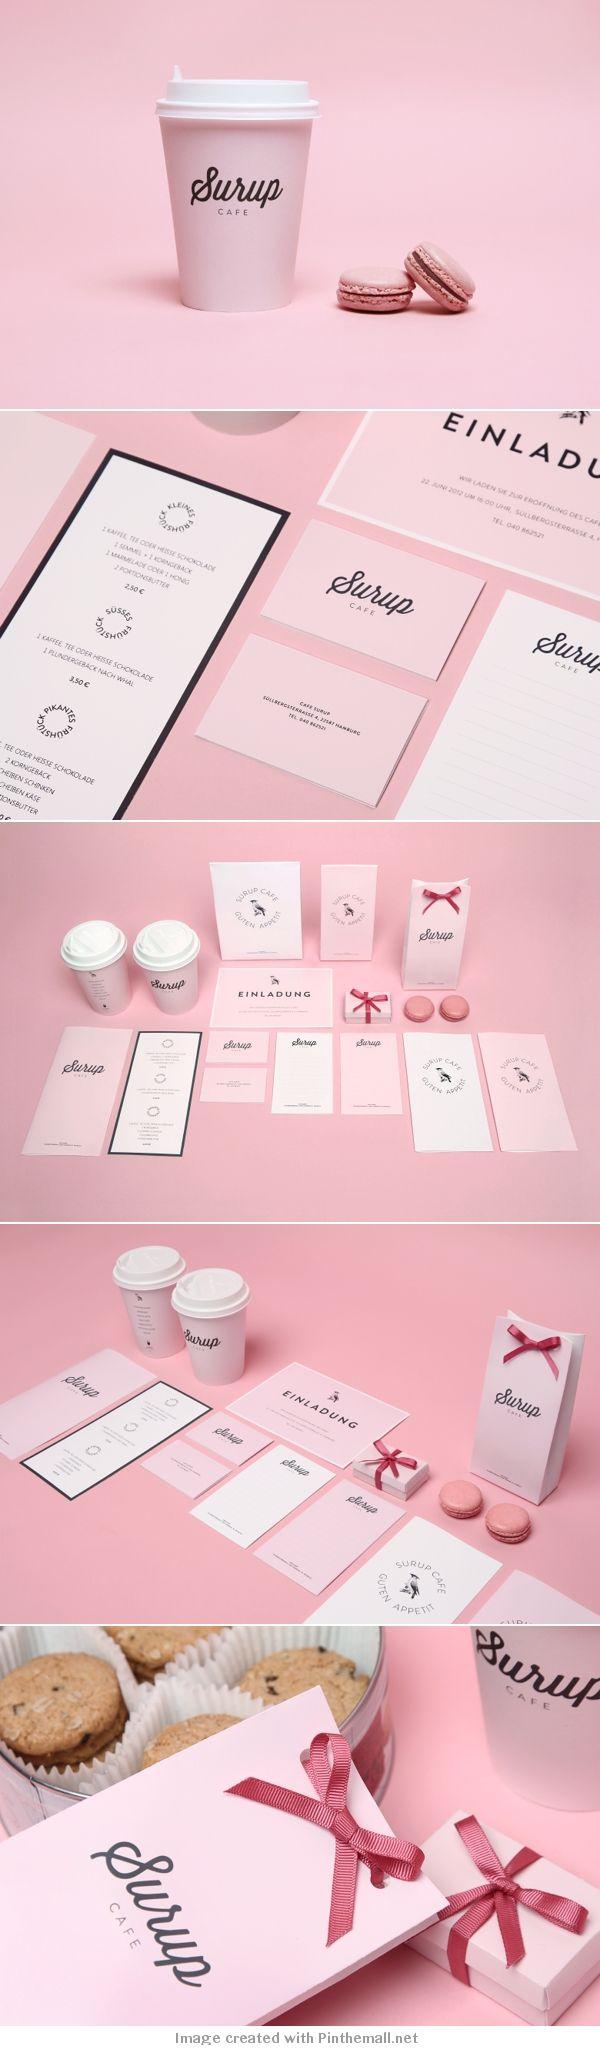 Surup Cafe Branding - Design & Art Direction by Sergey Parfenov